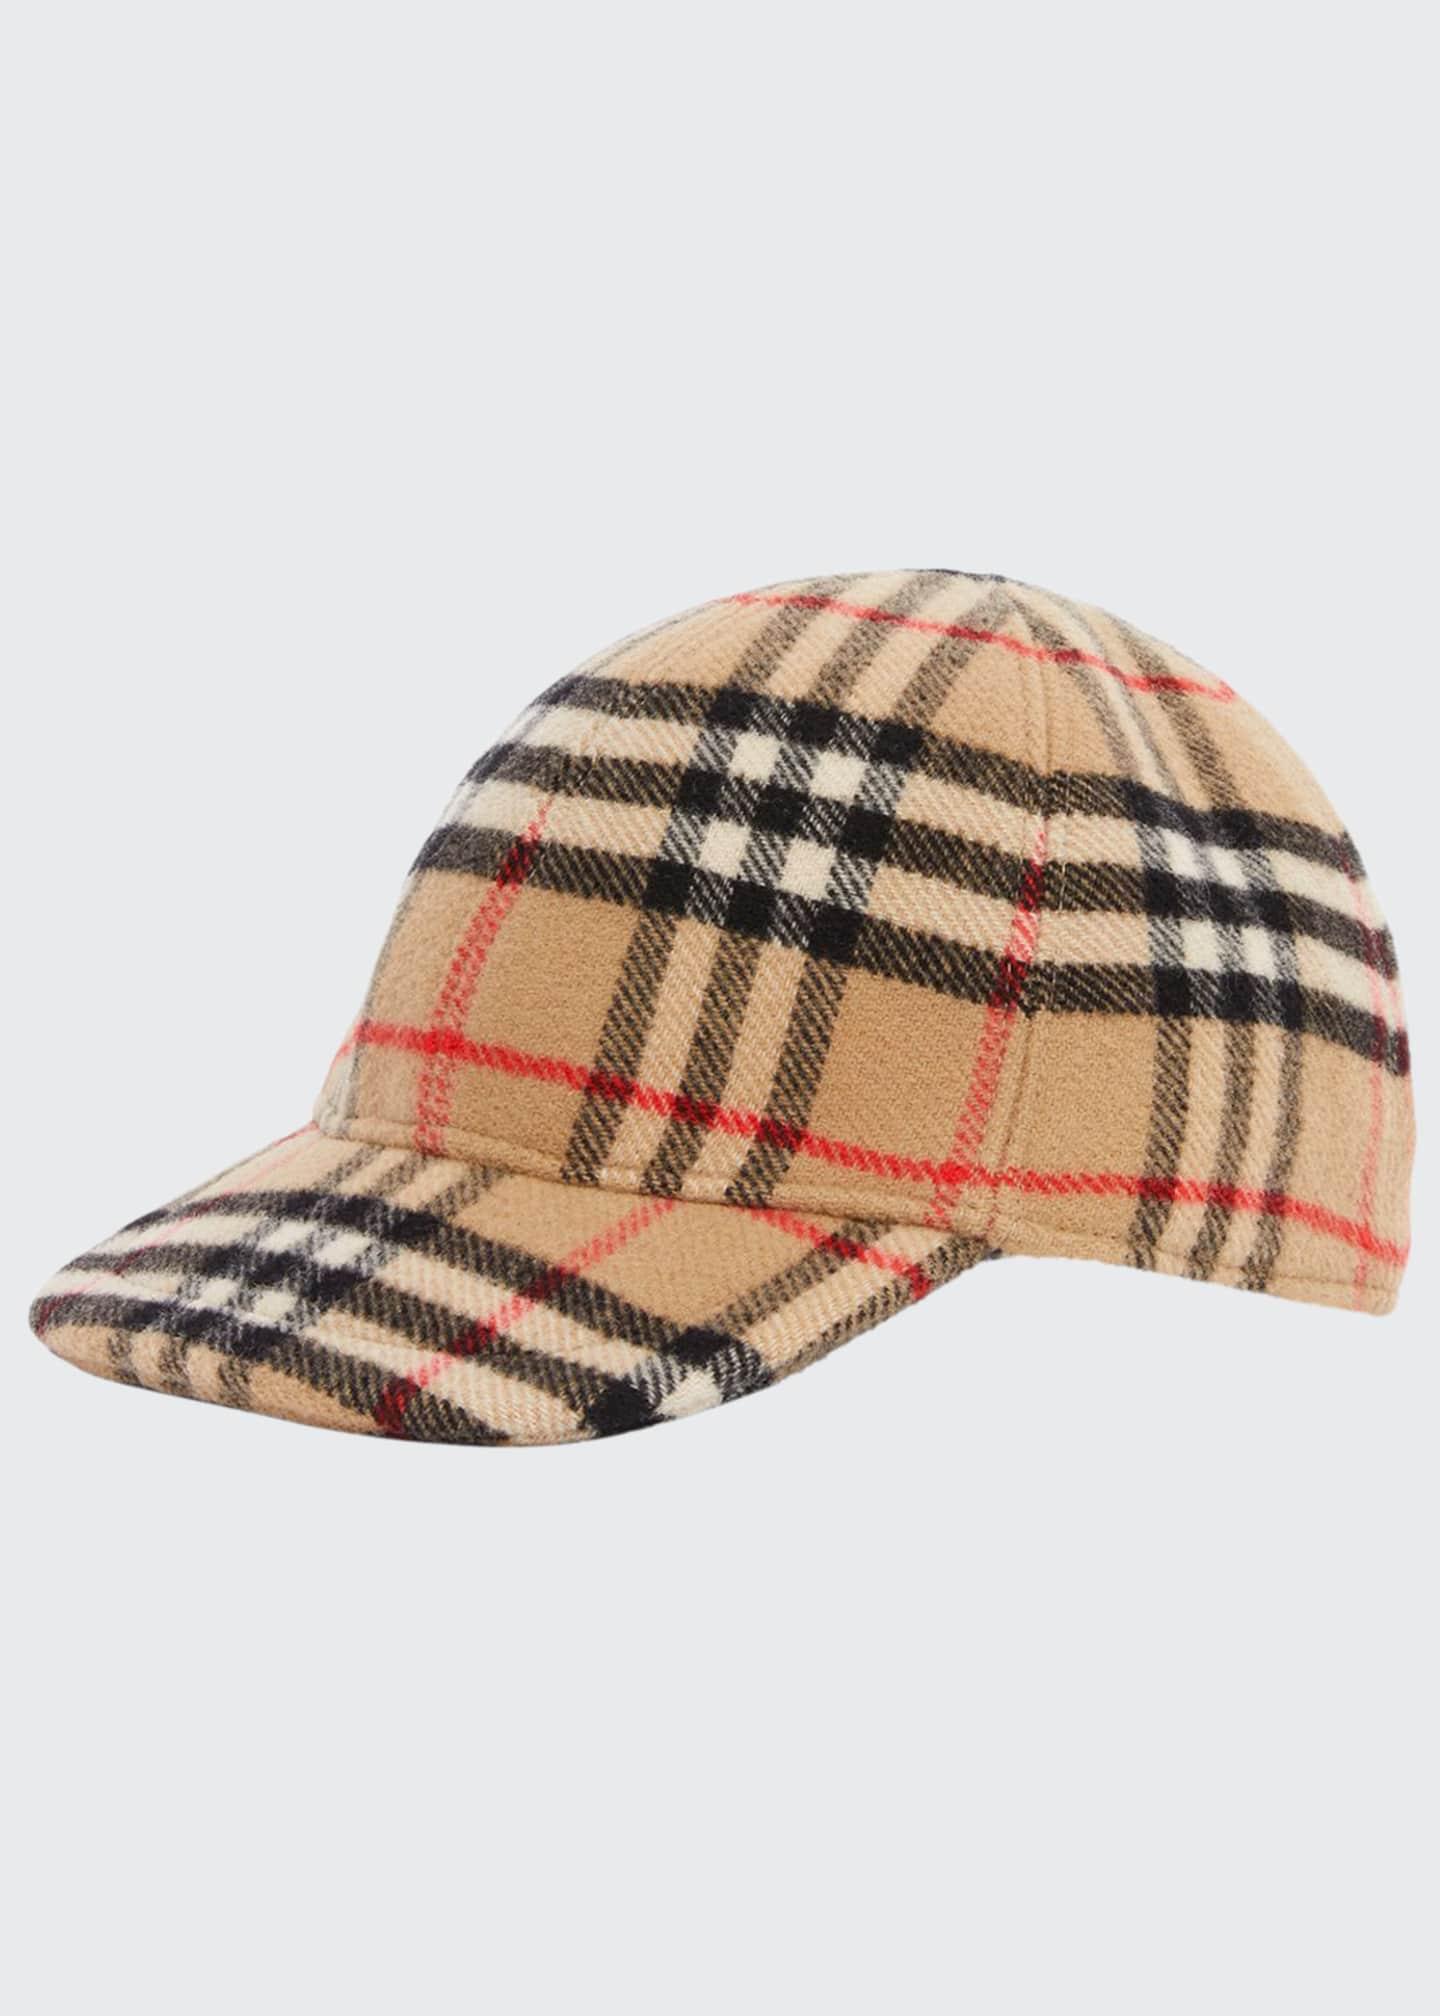 Burberry Kid's Wool Check Baseball Cap